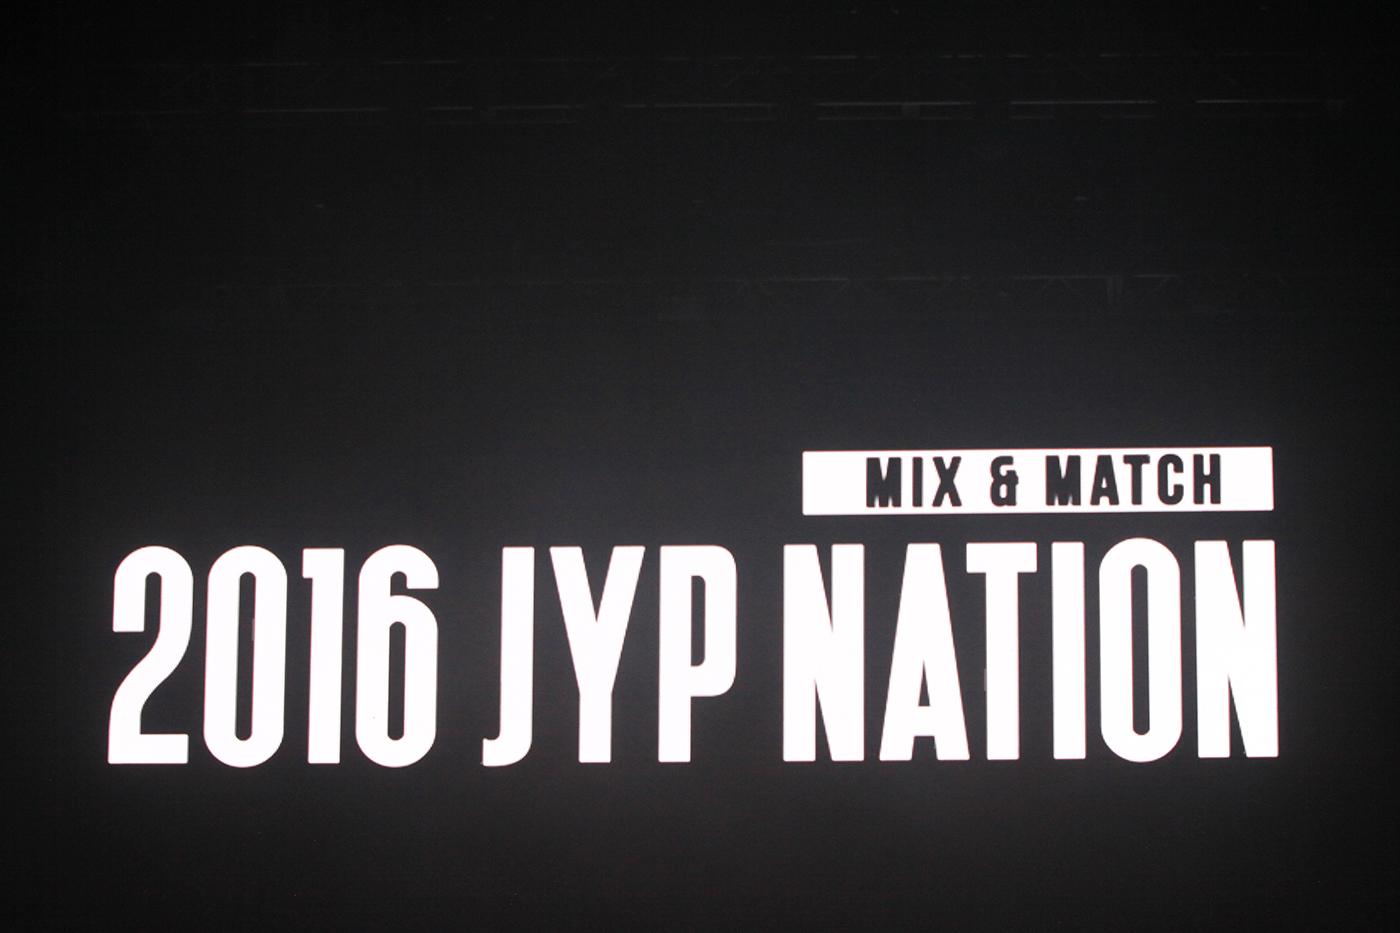 '2016 JYP NATION CONCERT MIX&MATCH' – JYP NATION 핫해! 핫해! ♬ 뜨거운 열기의 현장!